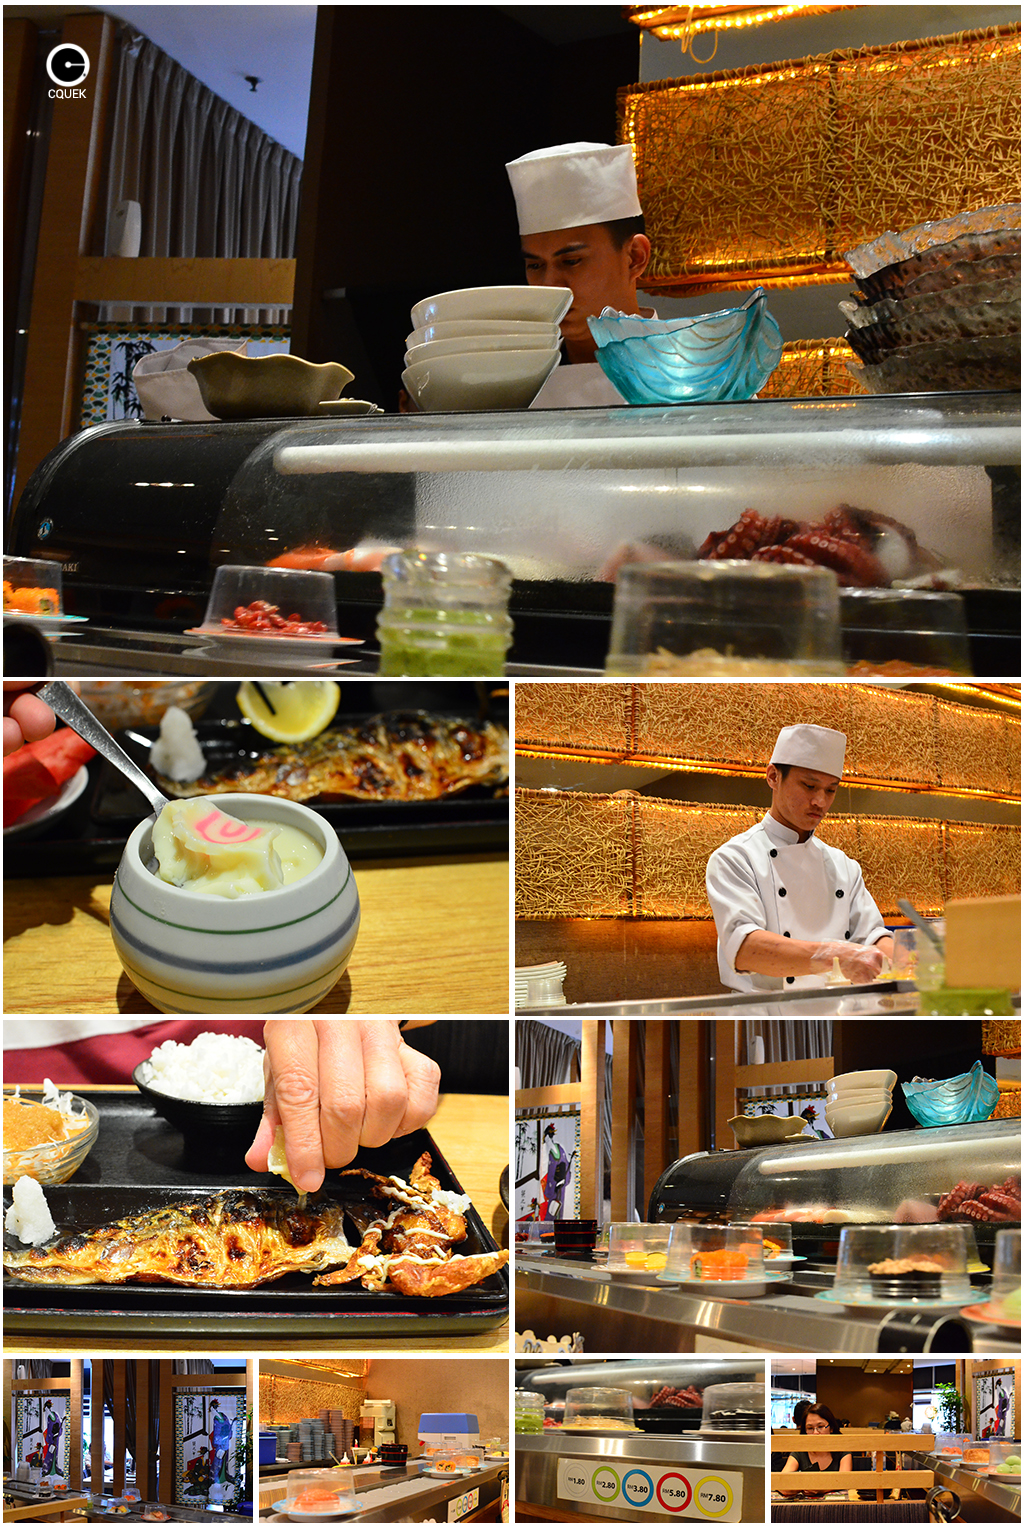 azuma japanese restaurant queensbay mall penang cquek. Black Bedroom Furniture Sets. Home Design Ideas